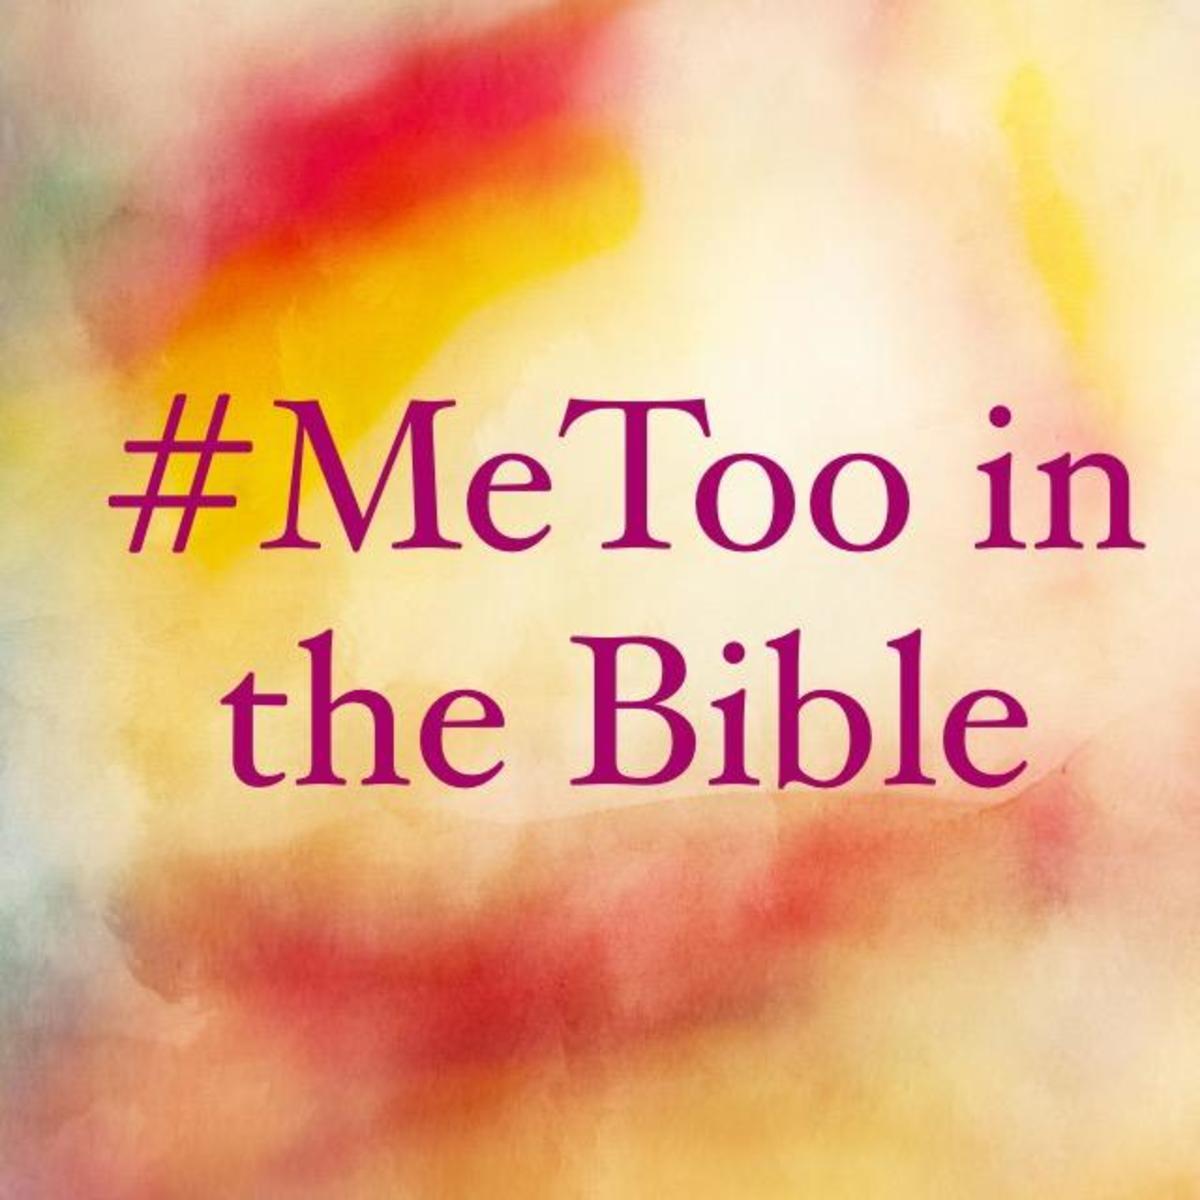 metoo-stories-in-the-bible